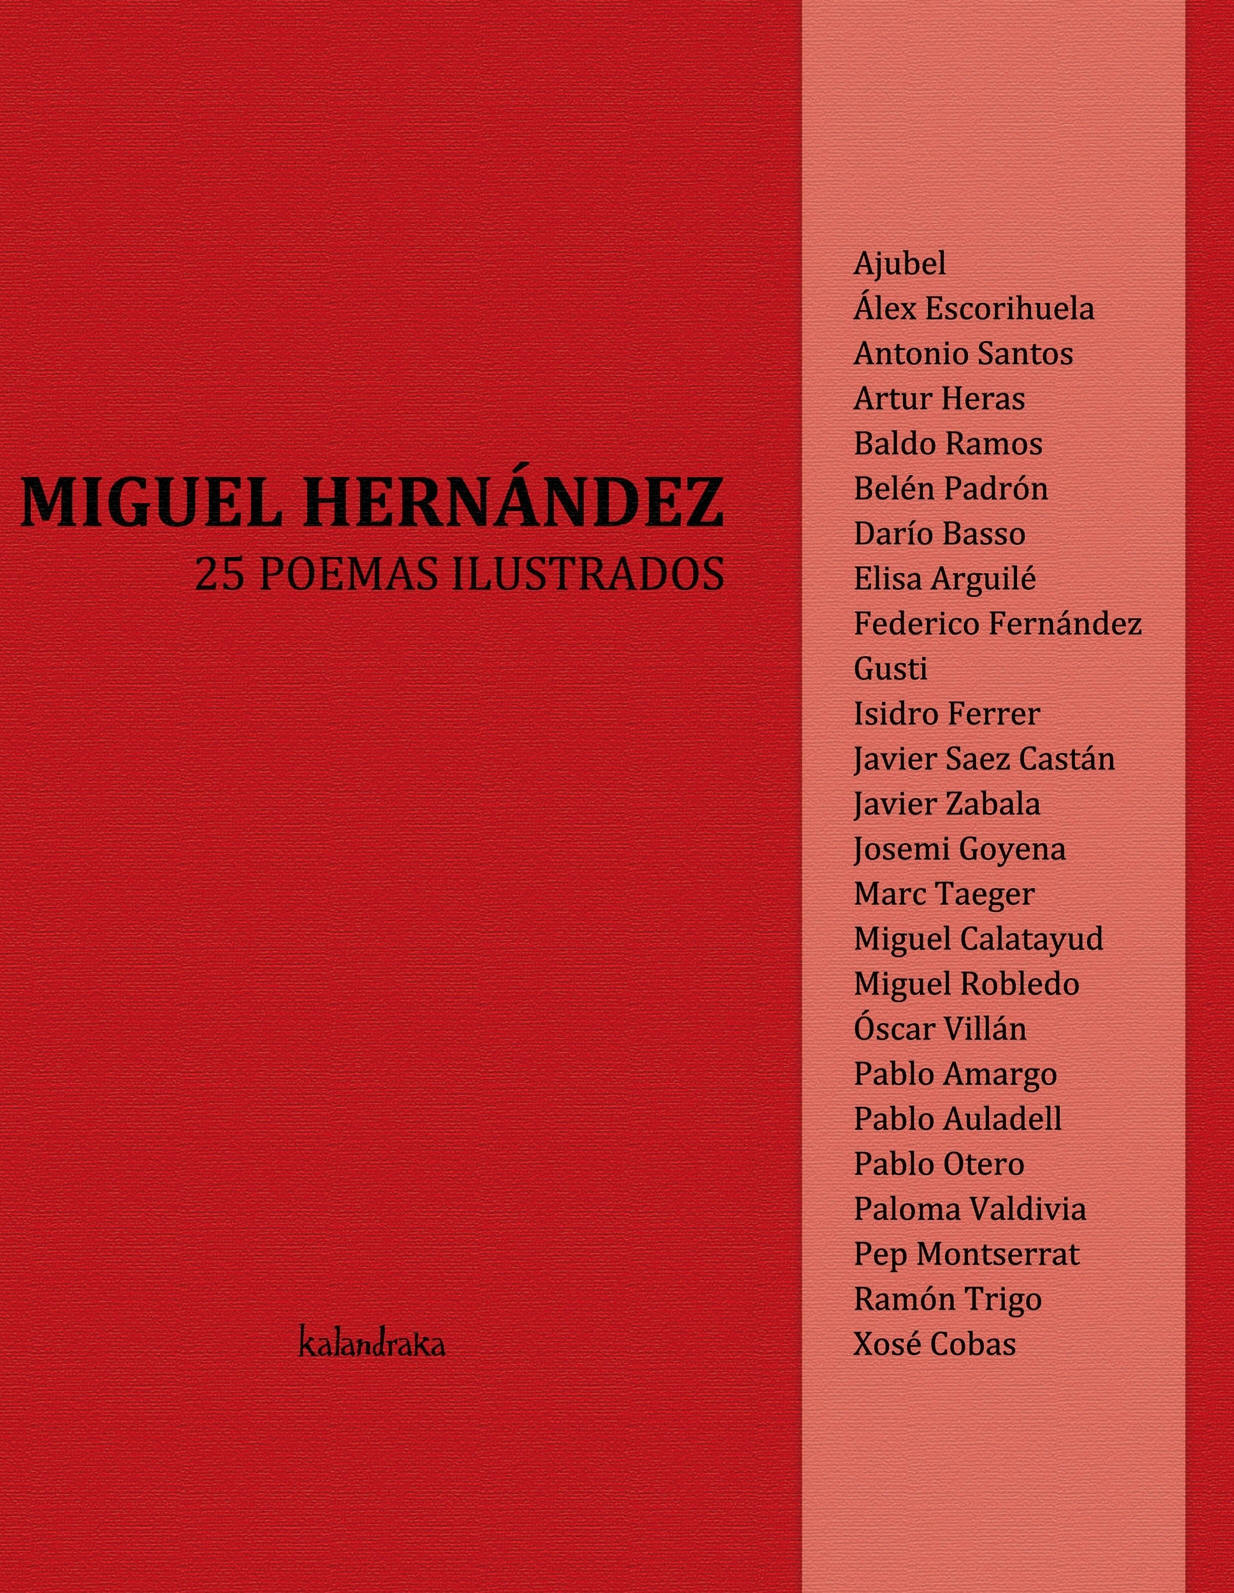 Kalandraka 2010 homenaje dedicado al poeta 25 artistas pl sticos traducen sus versos al lenguaje del arte a trav s de la pintura